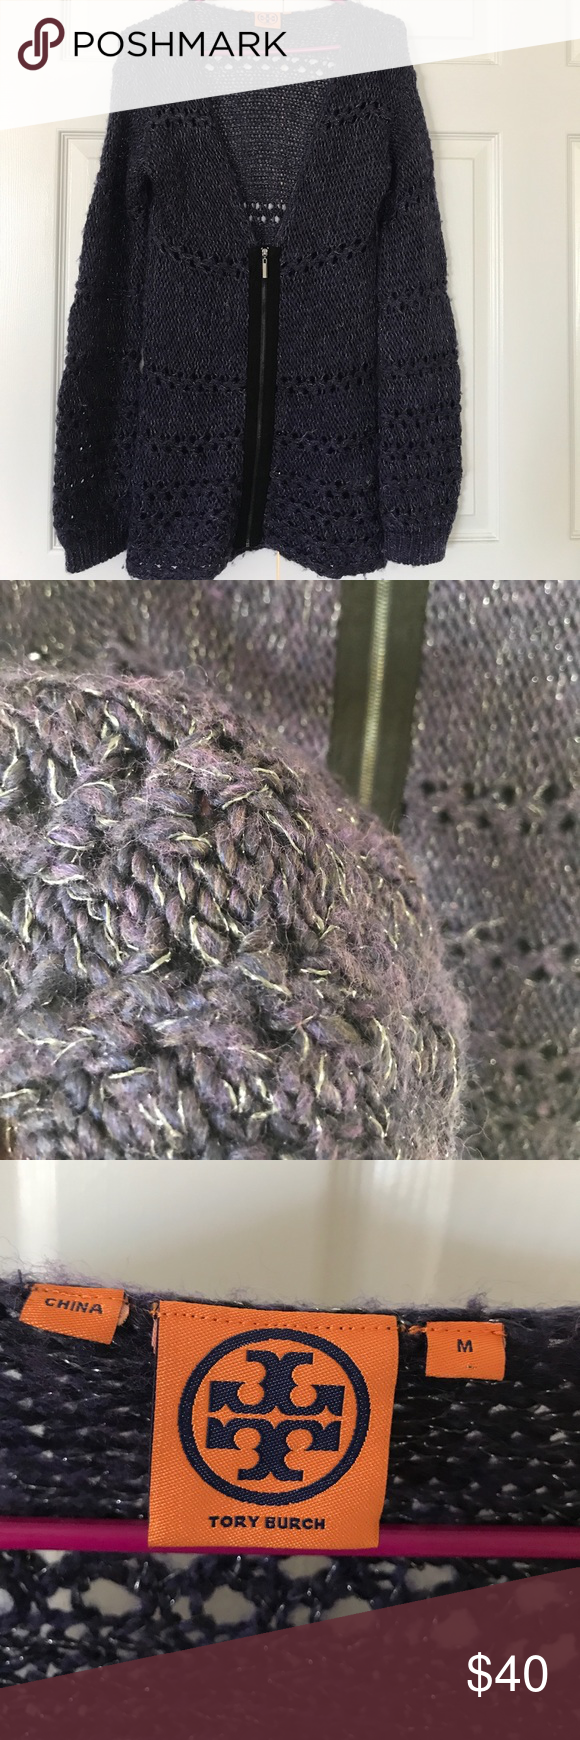 Tory Burch purple cardigan sweater Preloved.  Long style. Color is purple .. 47% wool 45% acrylic 6% acetate 1% metallic 1% nylon.. fits like M/L Tory Burch Sweaters Cardigans